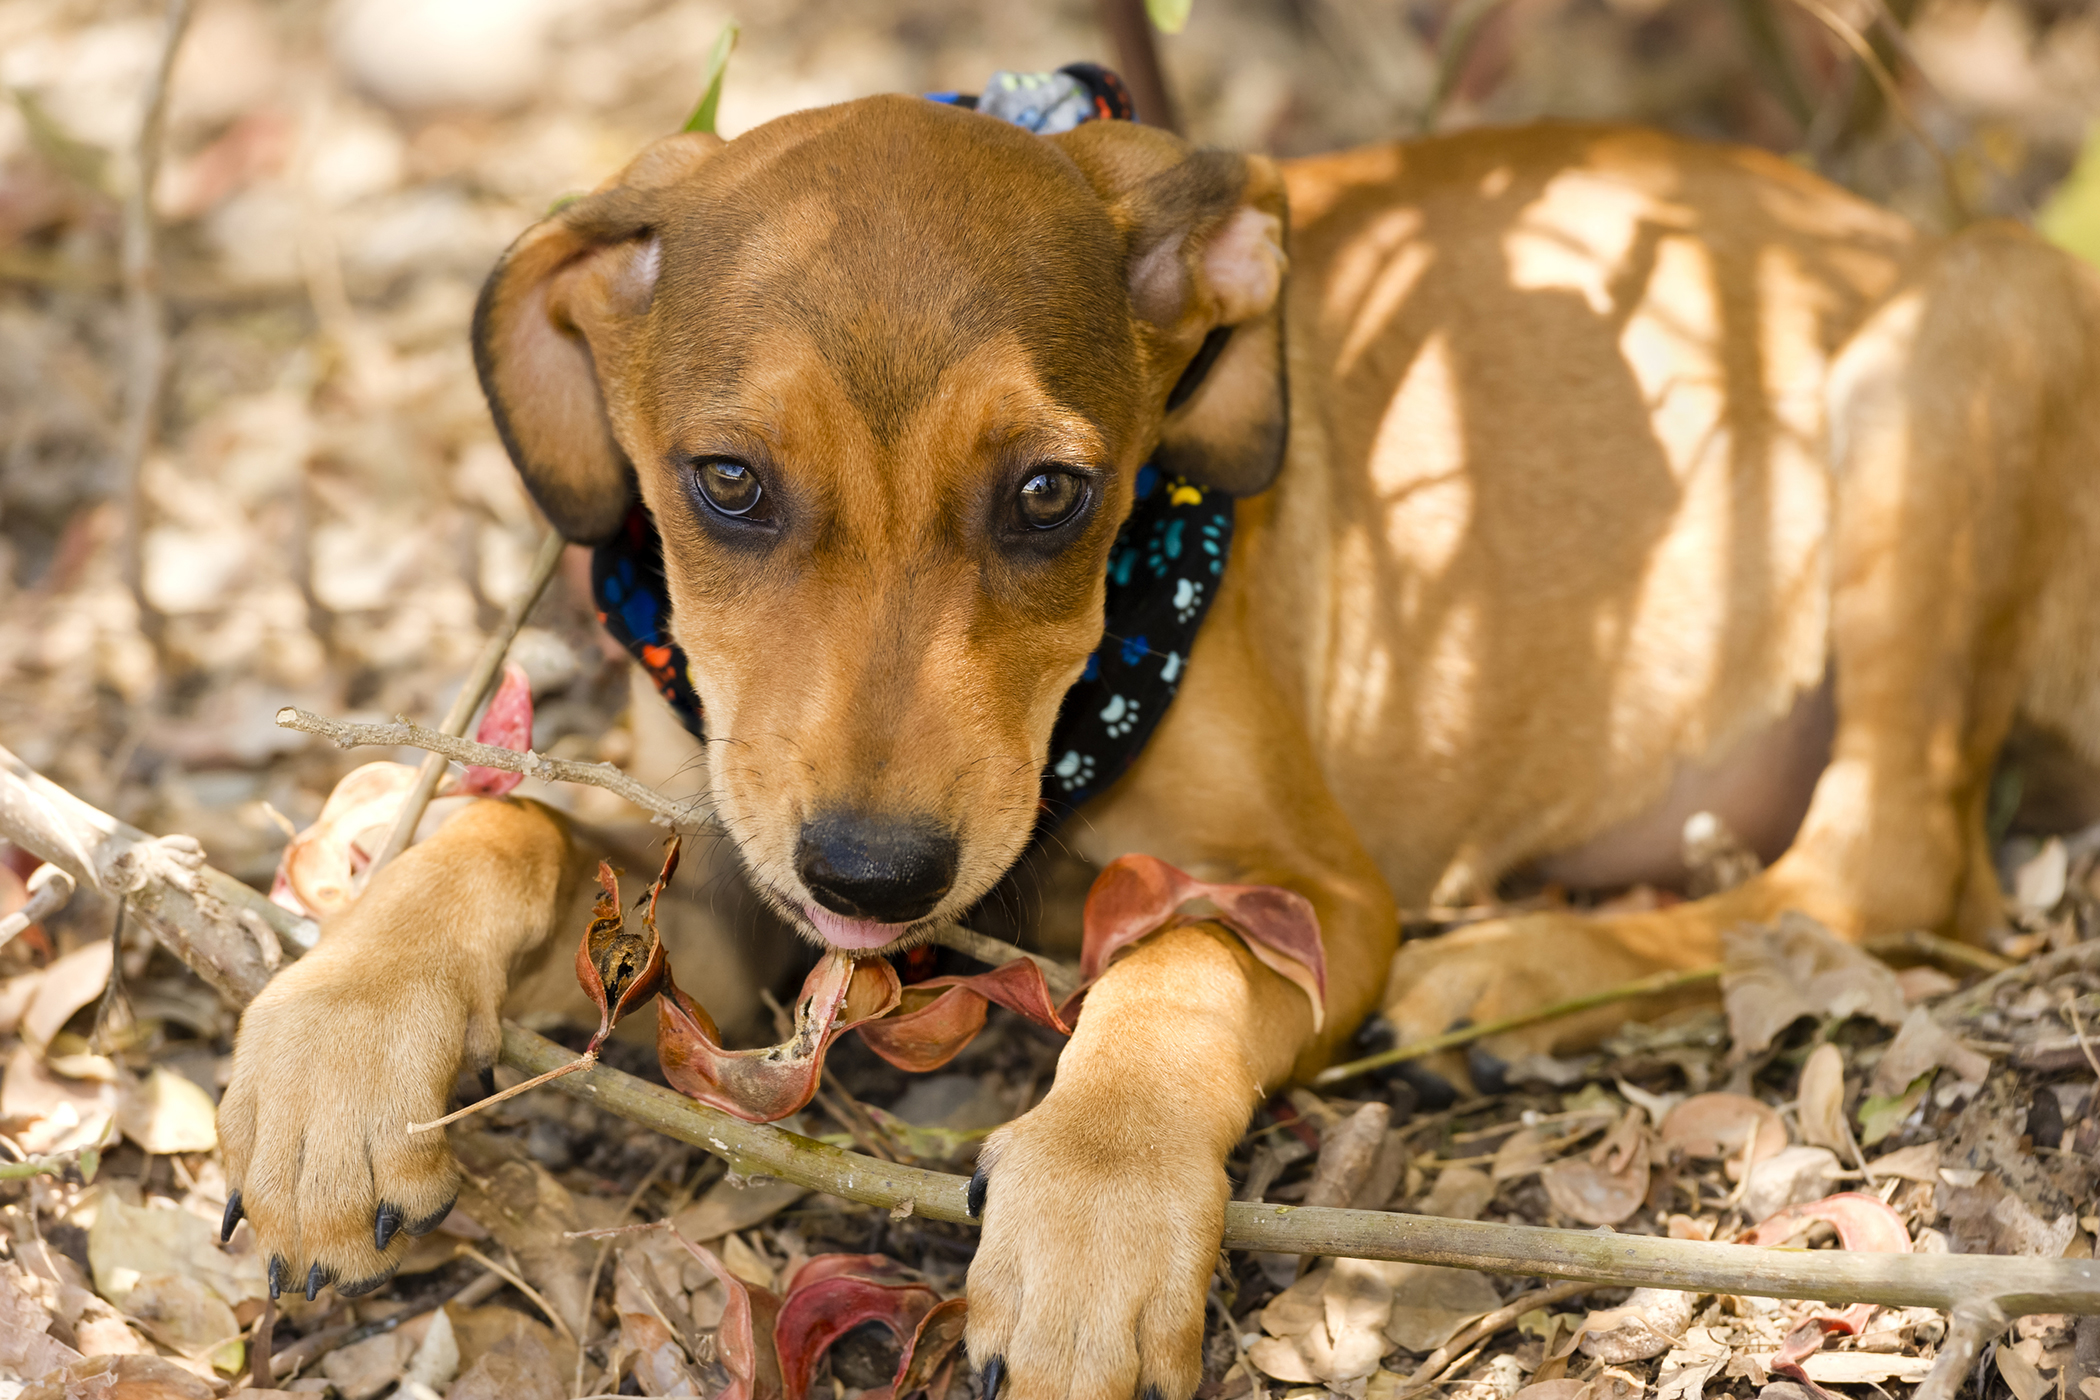 Median Sternotomy in Dogs